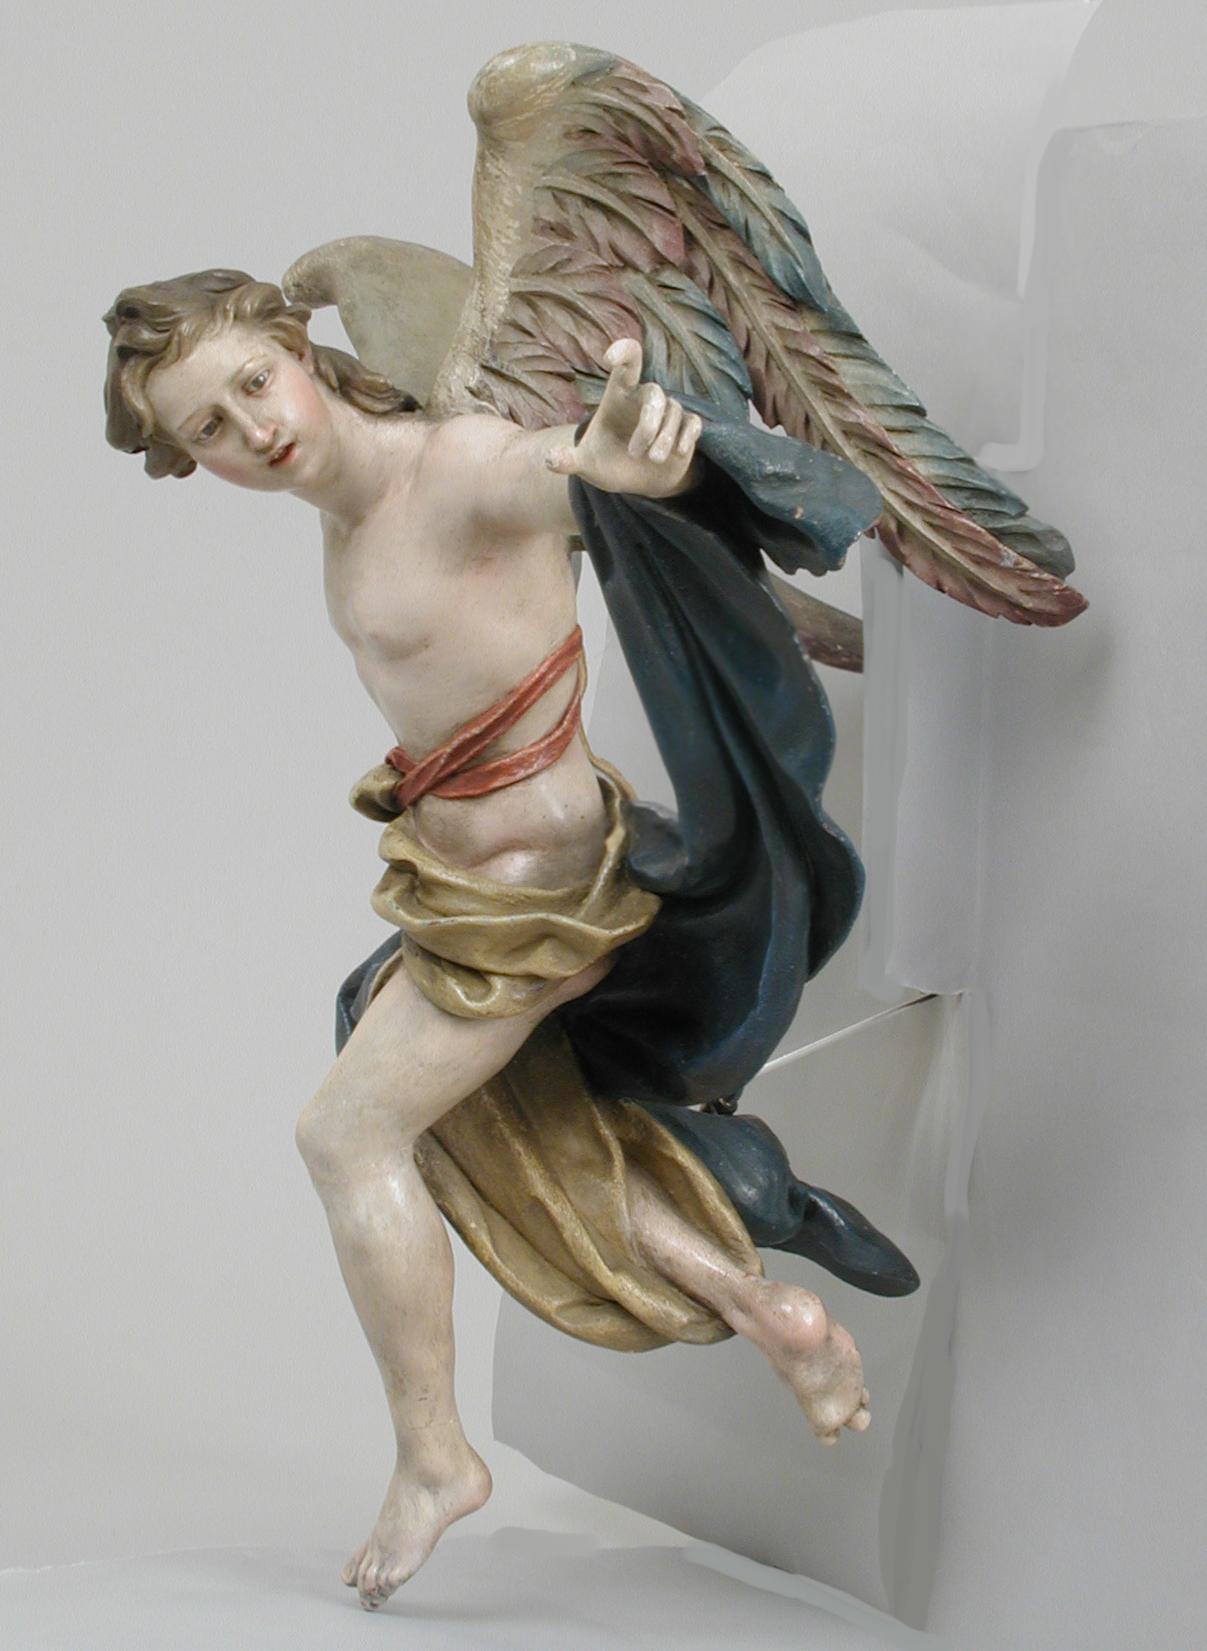 https://images.metmuseum.org/CRDImages/es/original/LC-64_164_167.jpg